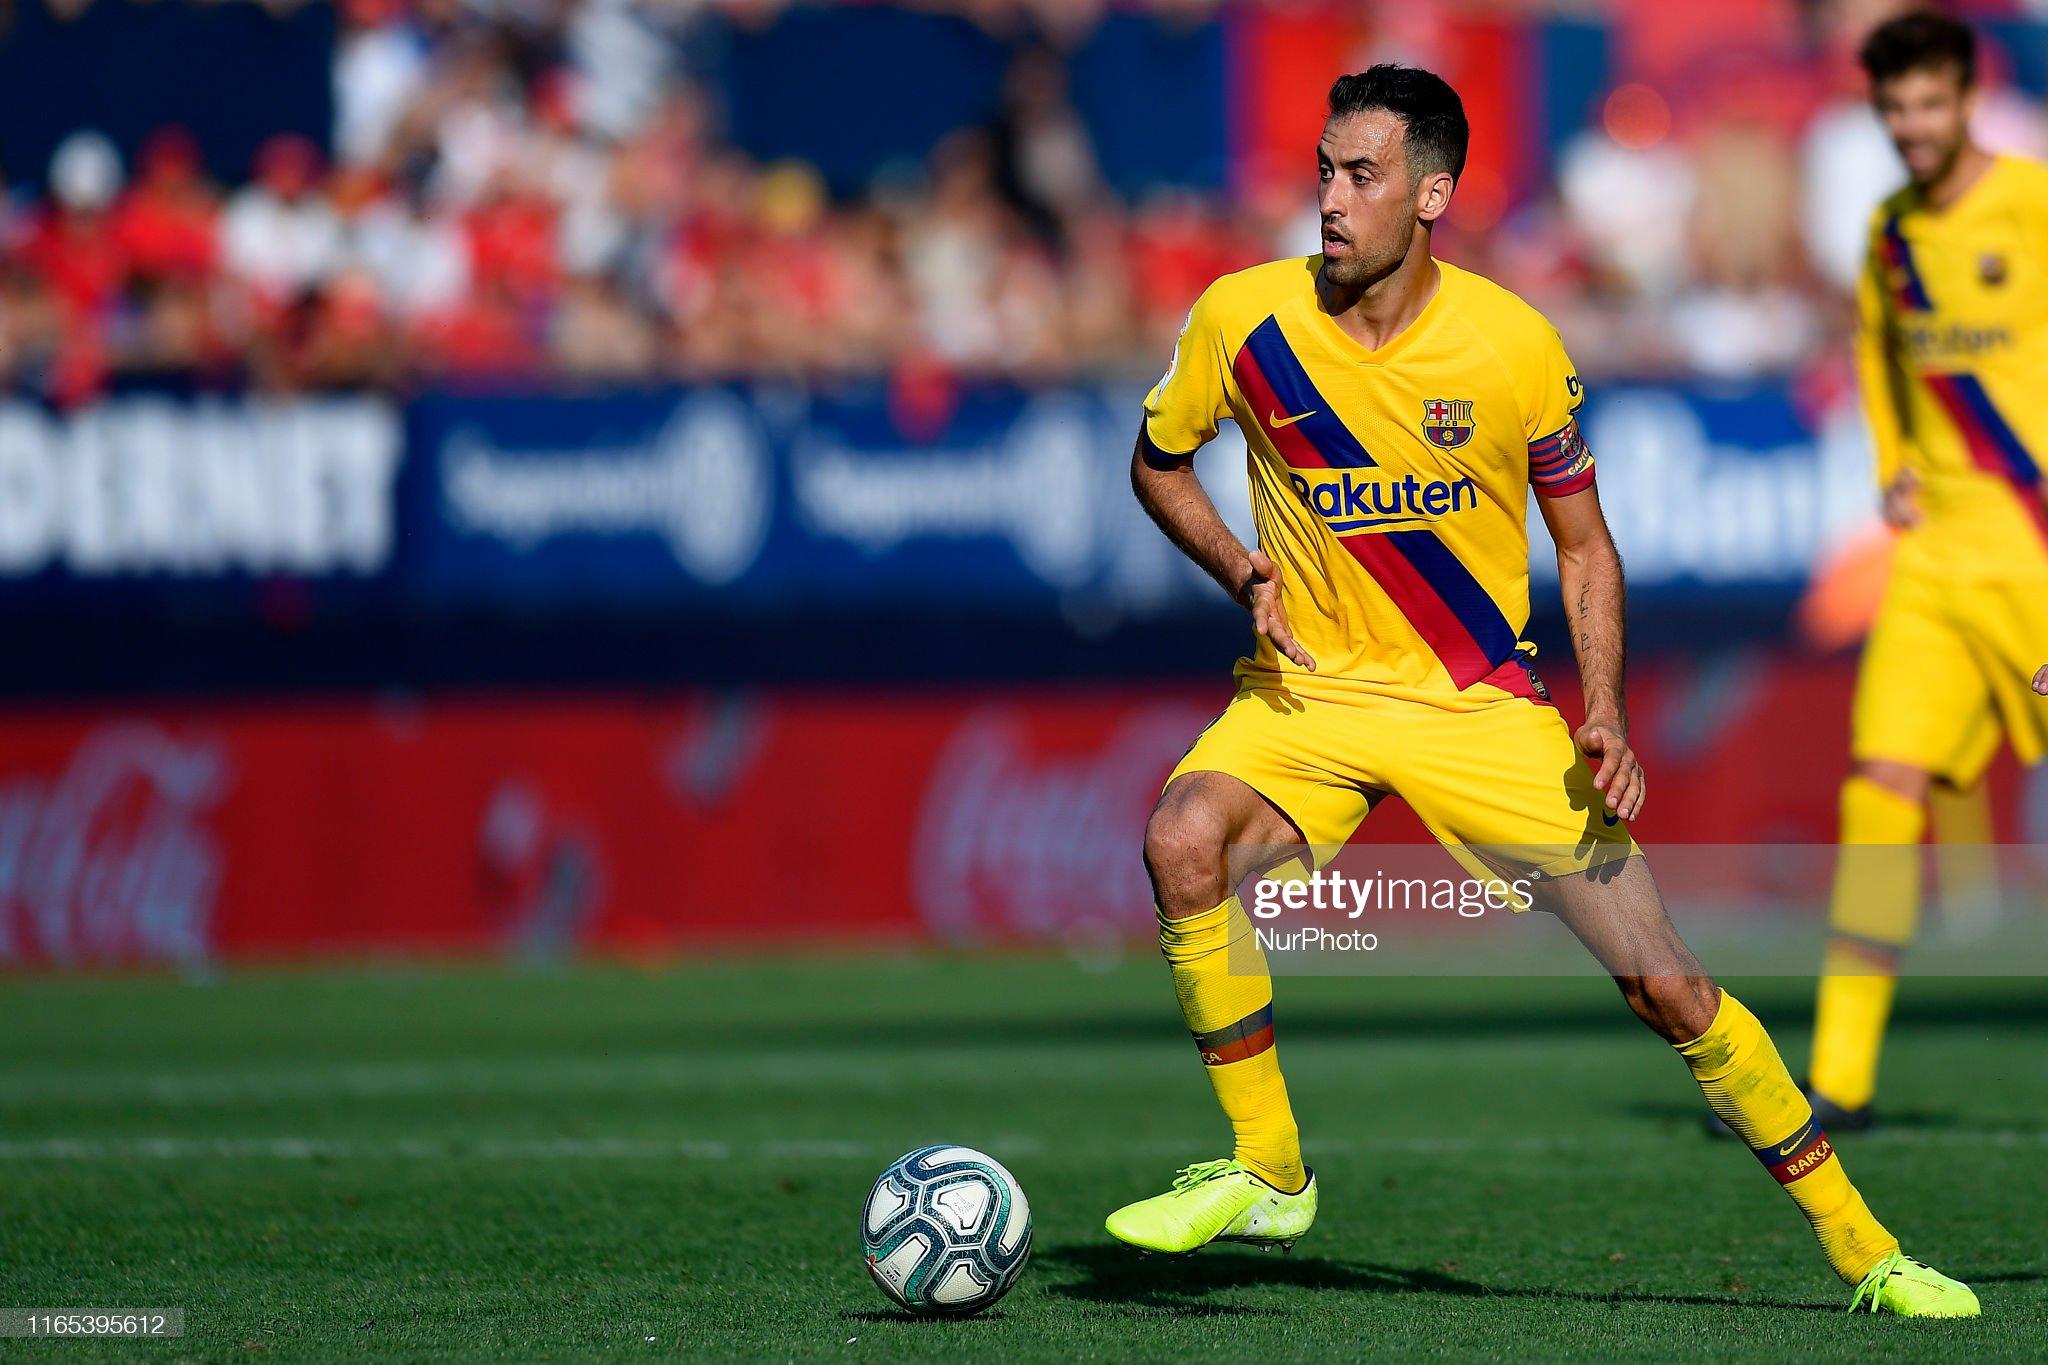 صور مباراة : أوساسونا - برشلونة 2-2 ( 31-08-2019 )  Sergio-busquets-of-barcelona-controls-the-ball-during-the-liga-match-picture-id1165395612?s=2048x2048